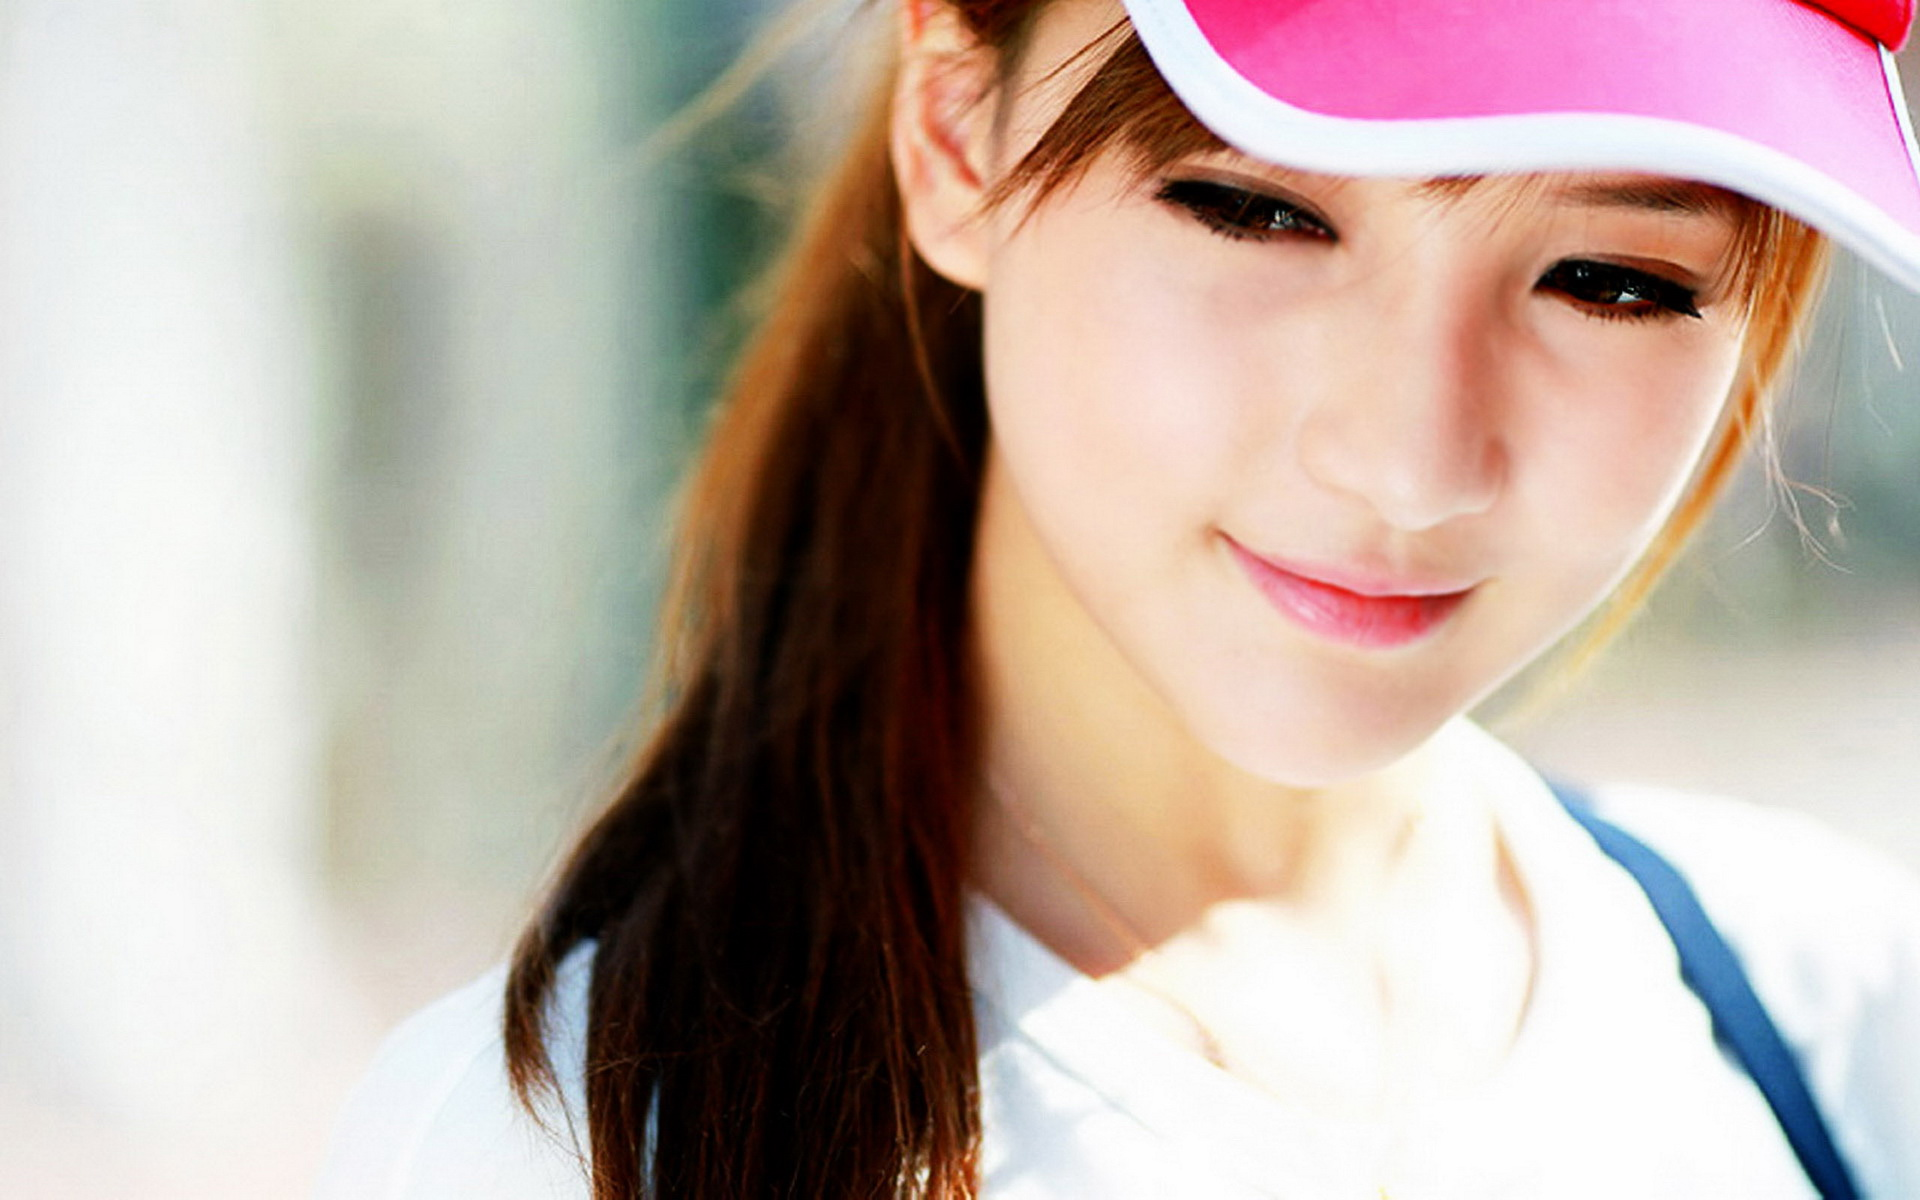 Hd wallpaper cute girl - Description Cute Asian Girl Wallpaper Hd Is A Hi Res Wallpaper For Pc